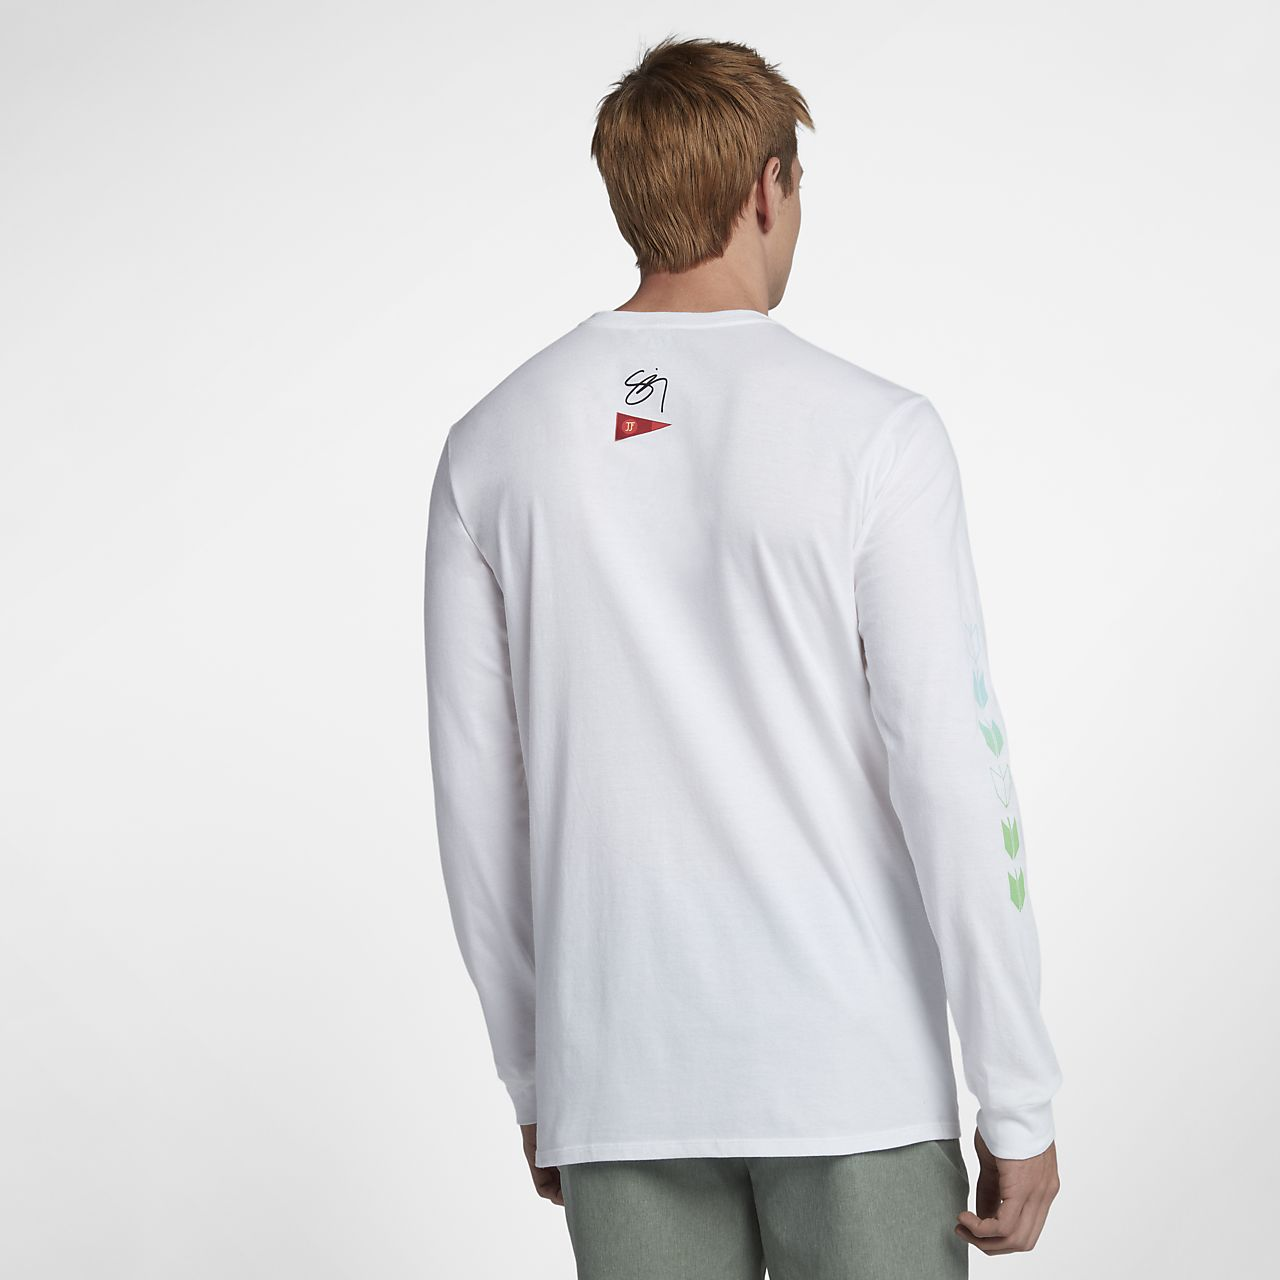 Hurley JJF x Sig Zane Men's Long Sleeve T-Shirt. Nike.com